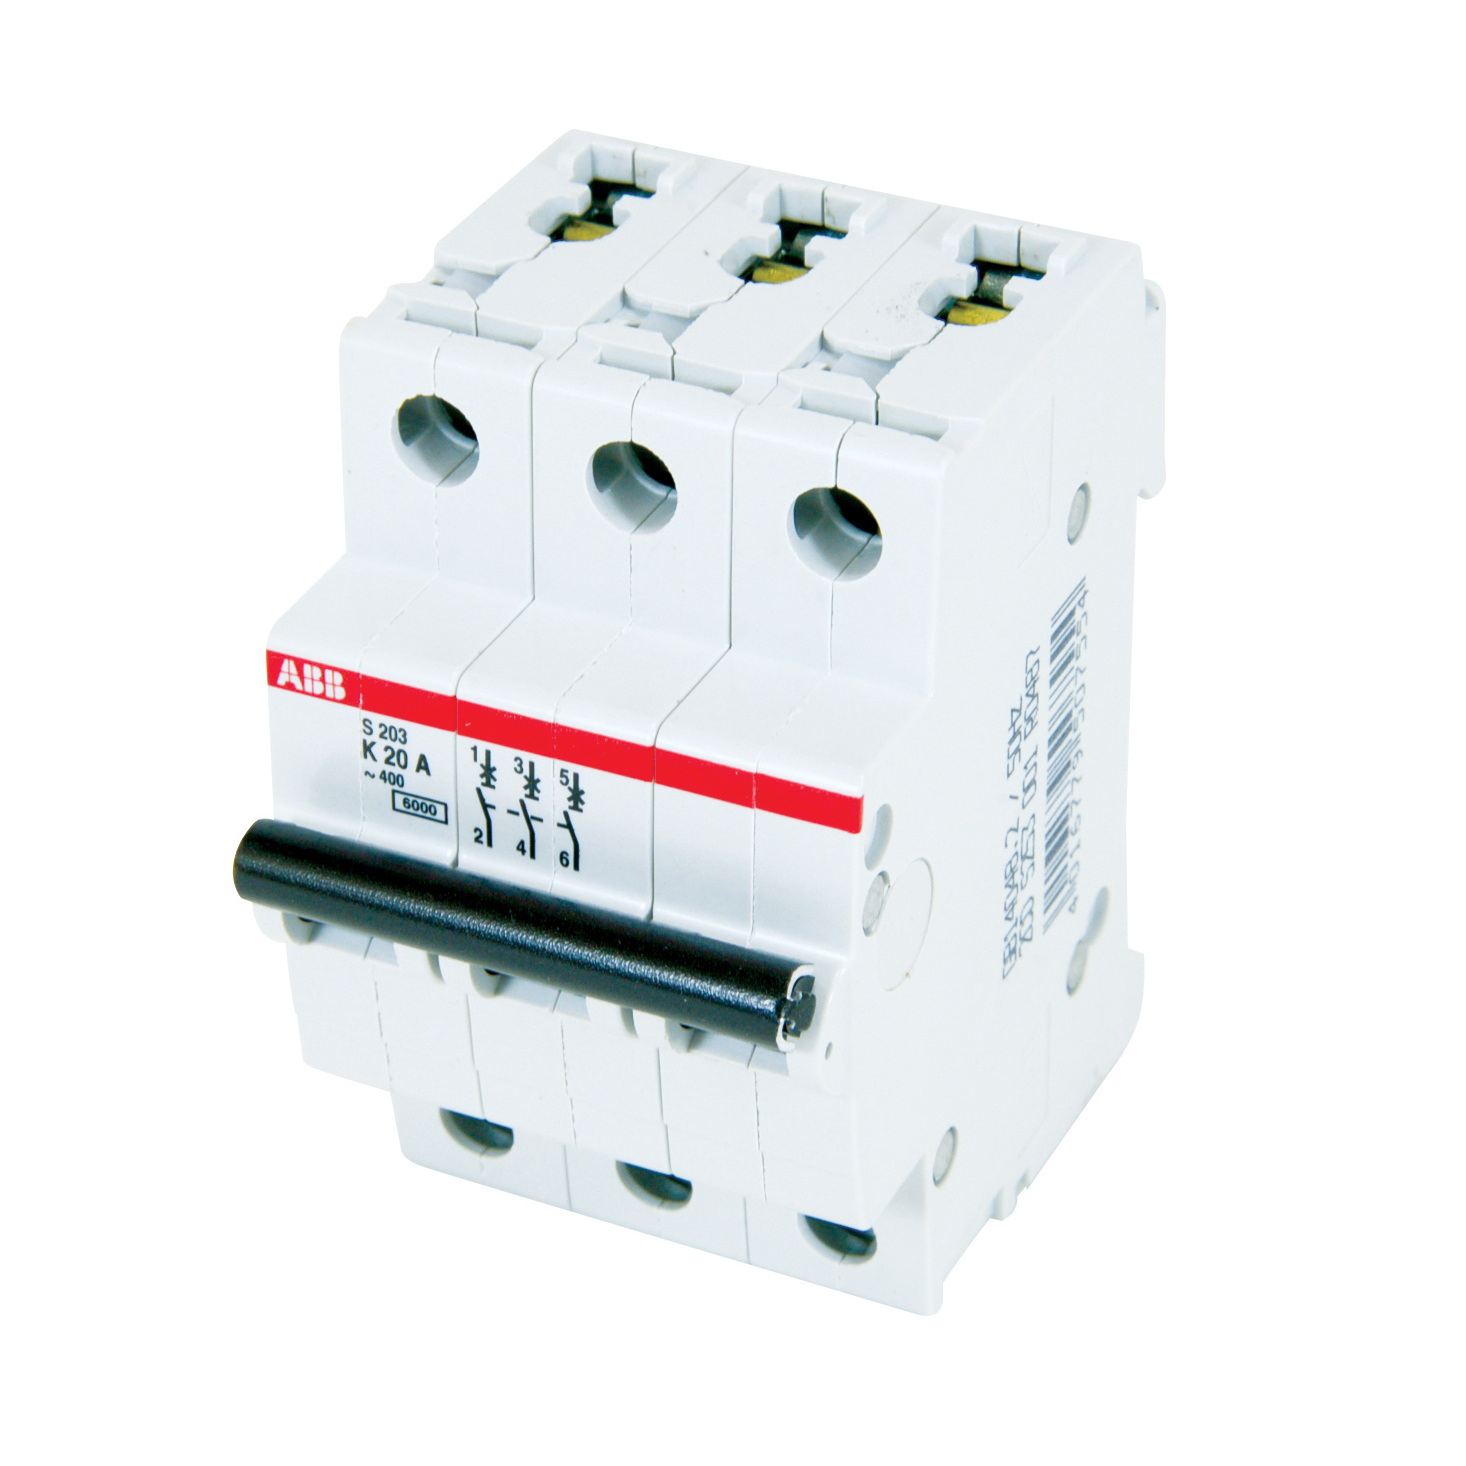 ABB,S203-K20,ABB S200 Miniature Circuit Breaker, 277/480 VAC, 20 A, 6 kA Interrupt, 3 Poles, Thermal Magnetic Trip